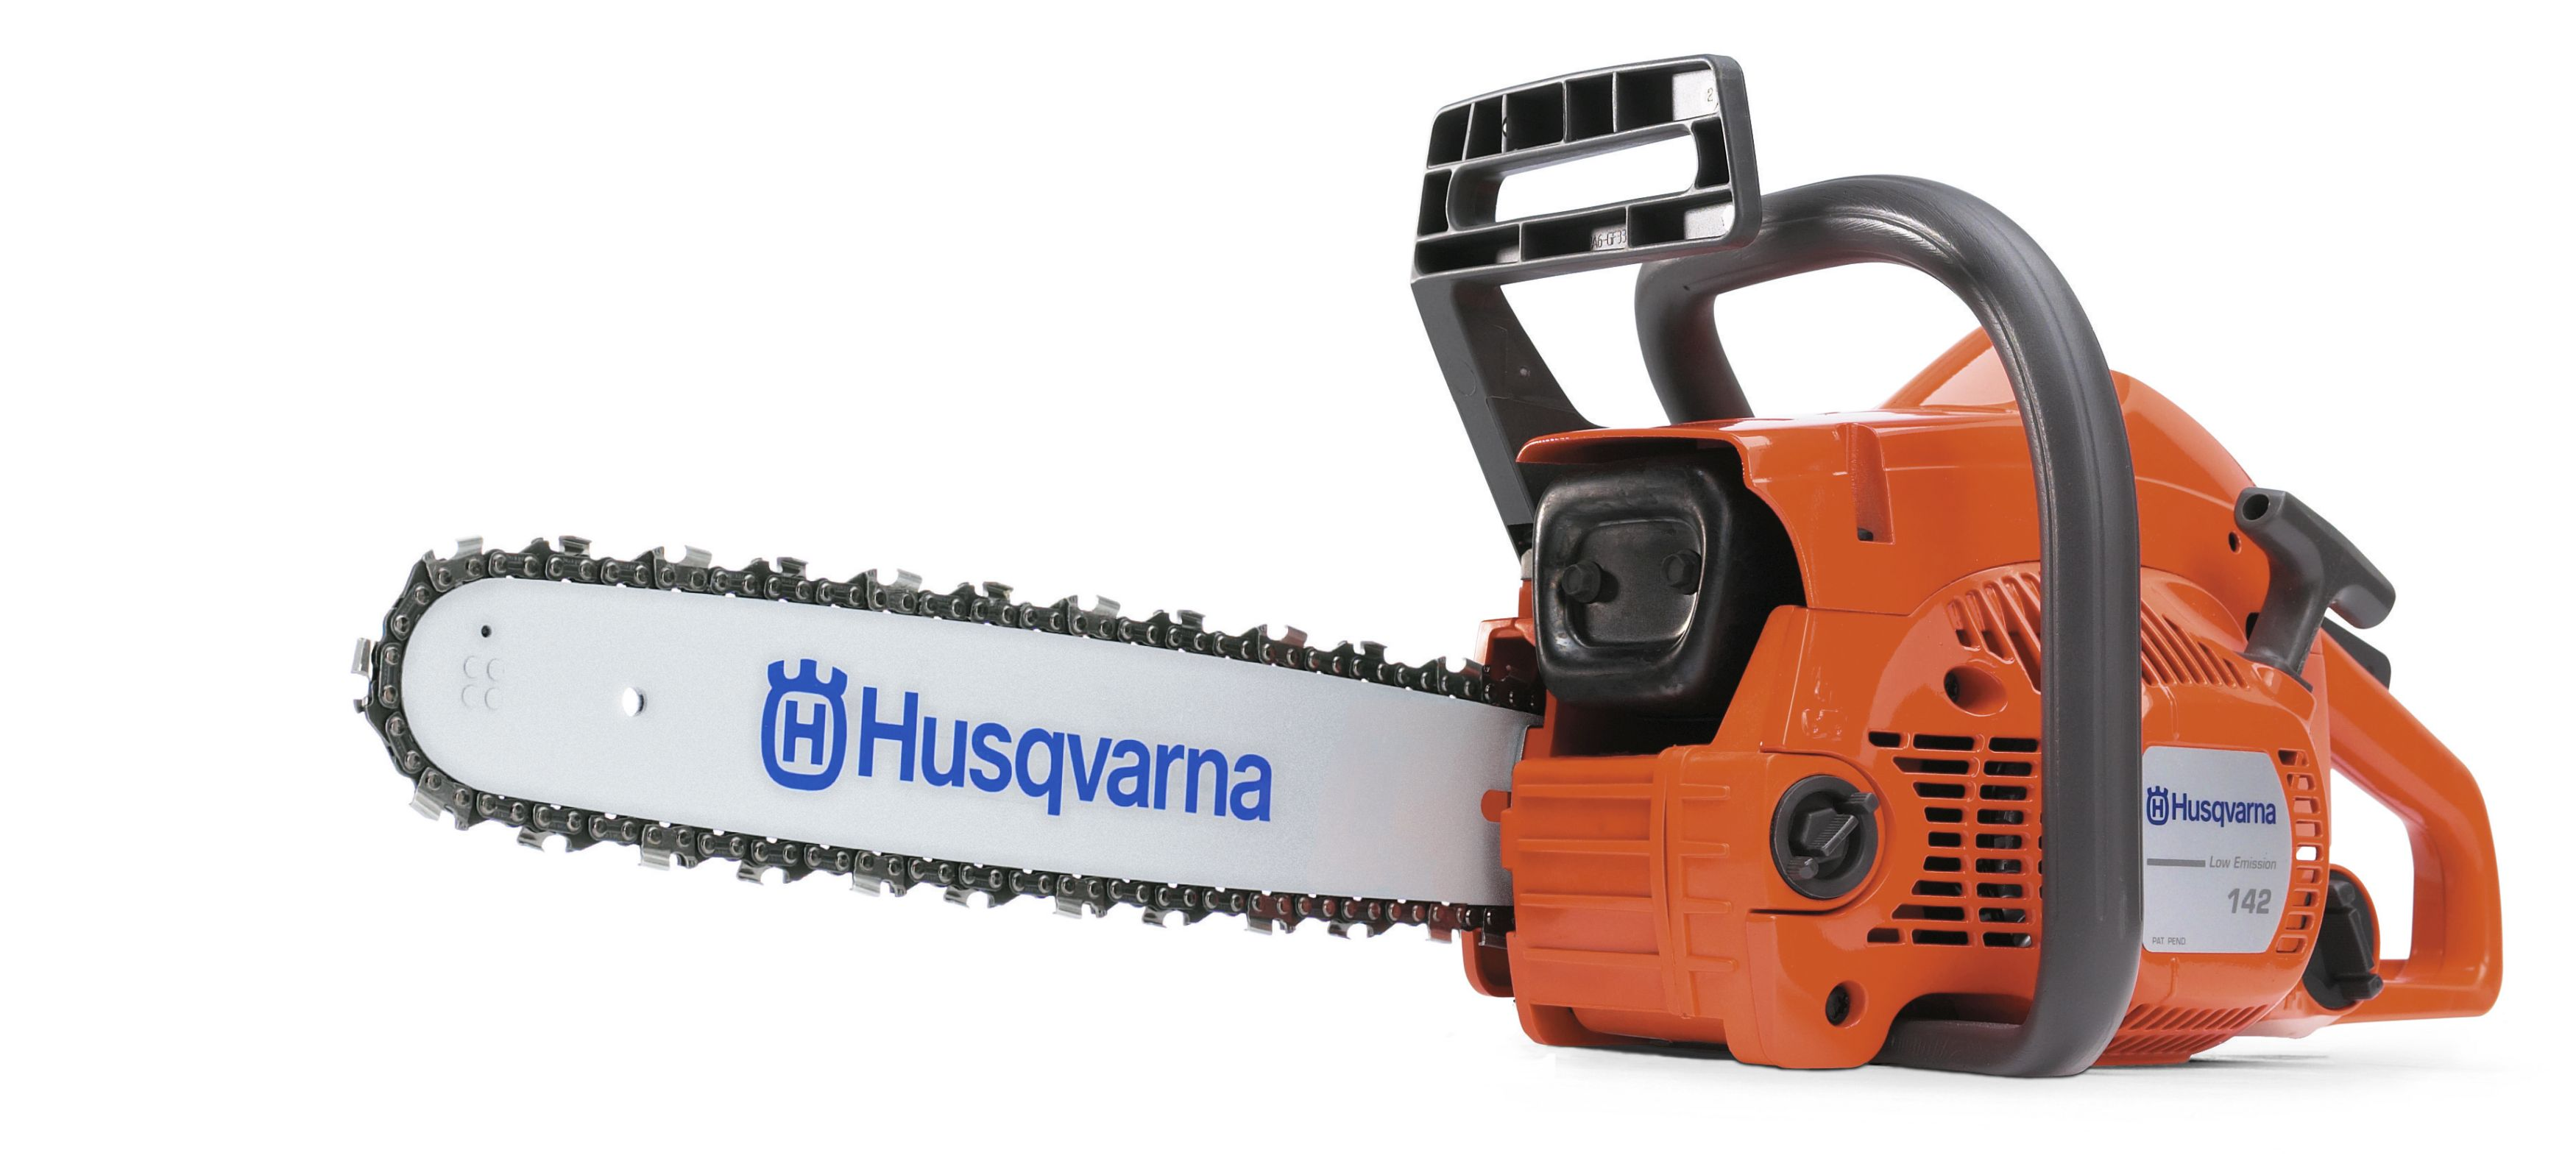 Husqvarna 136, Husqvarna 137, Husqvarna 141 and Husqvarna 142, husqvarna replacement parts, husqvarna aftermarket parts